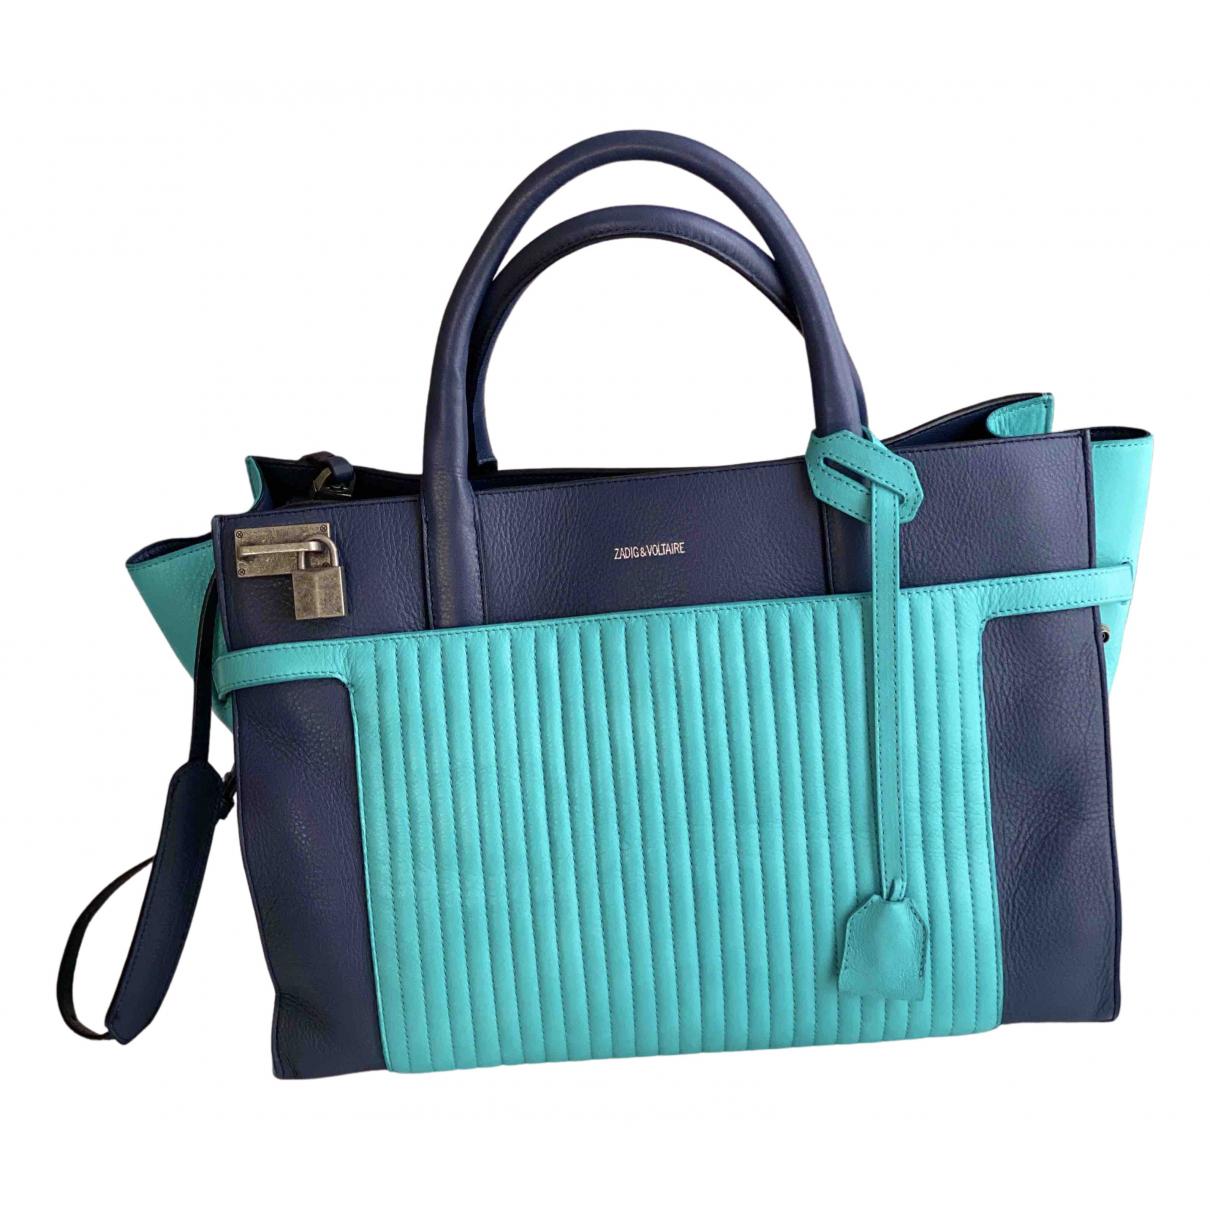 Zadig & Voltaire Candide Blue Leather handbag for Women N